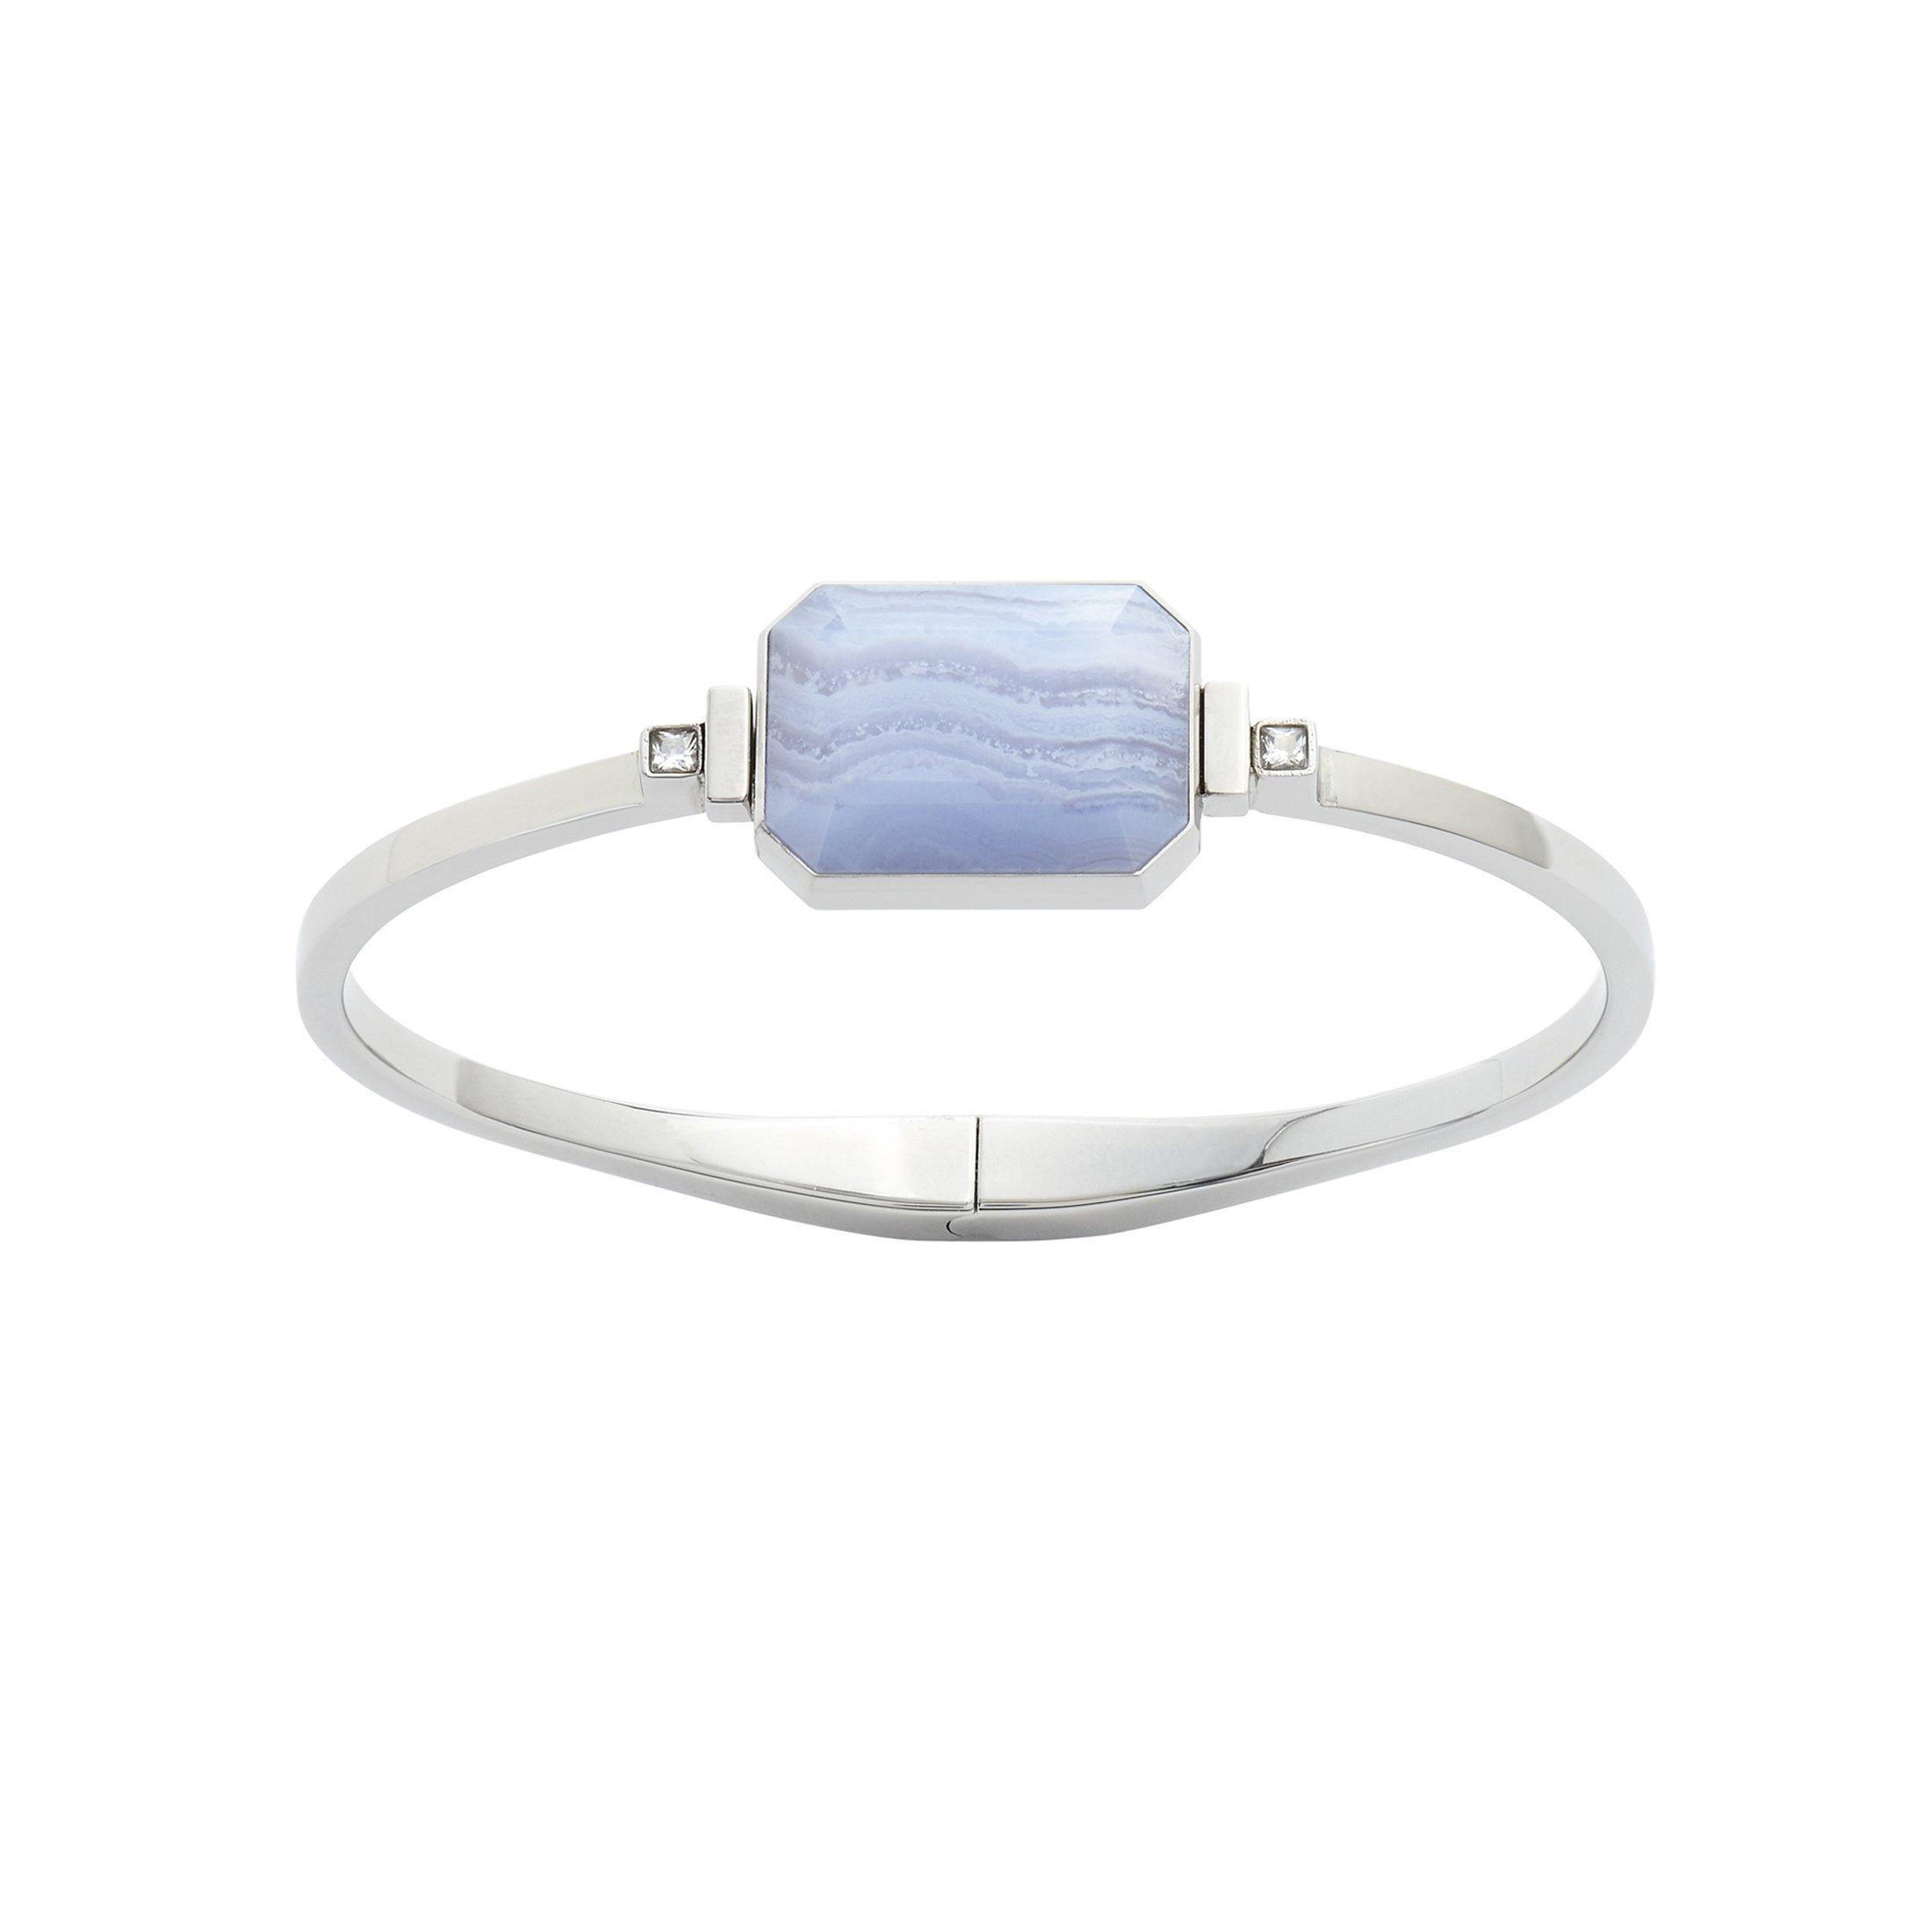 Ringly Luxe - Activity Tracker + Mobile Alerts + Meditation Smart Bracelet